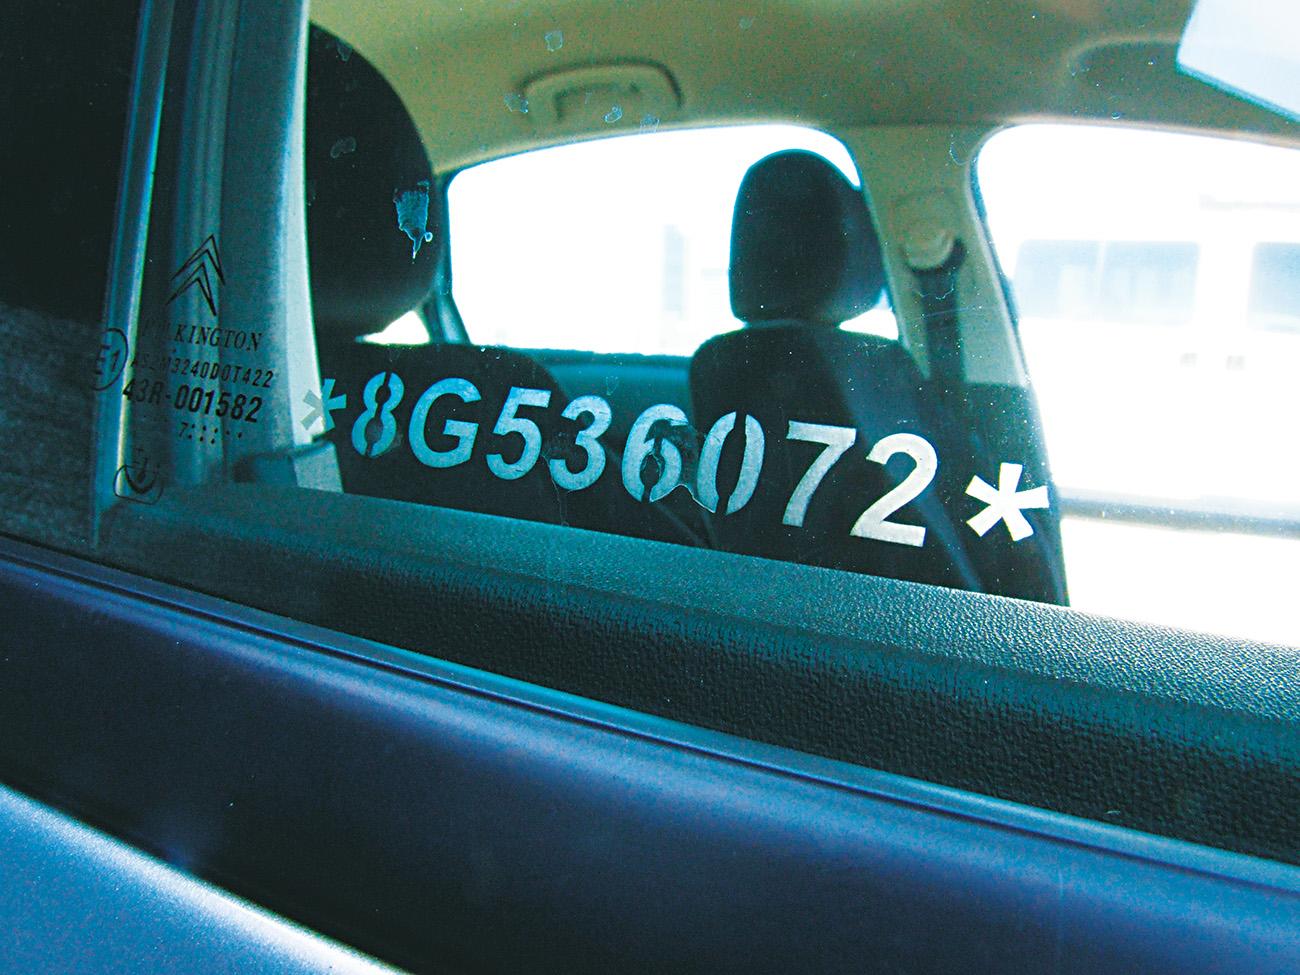 Número do chassi no vidro